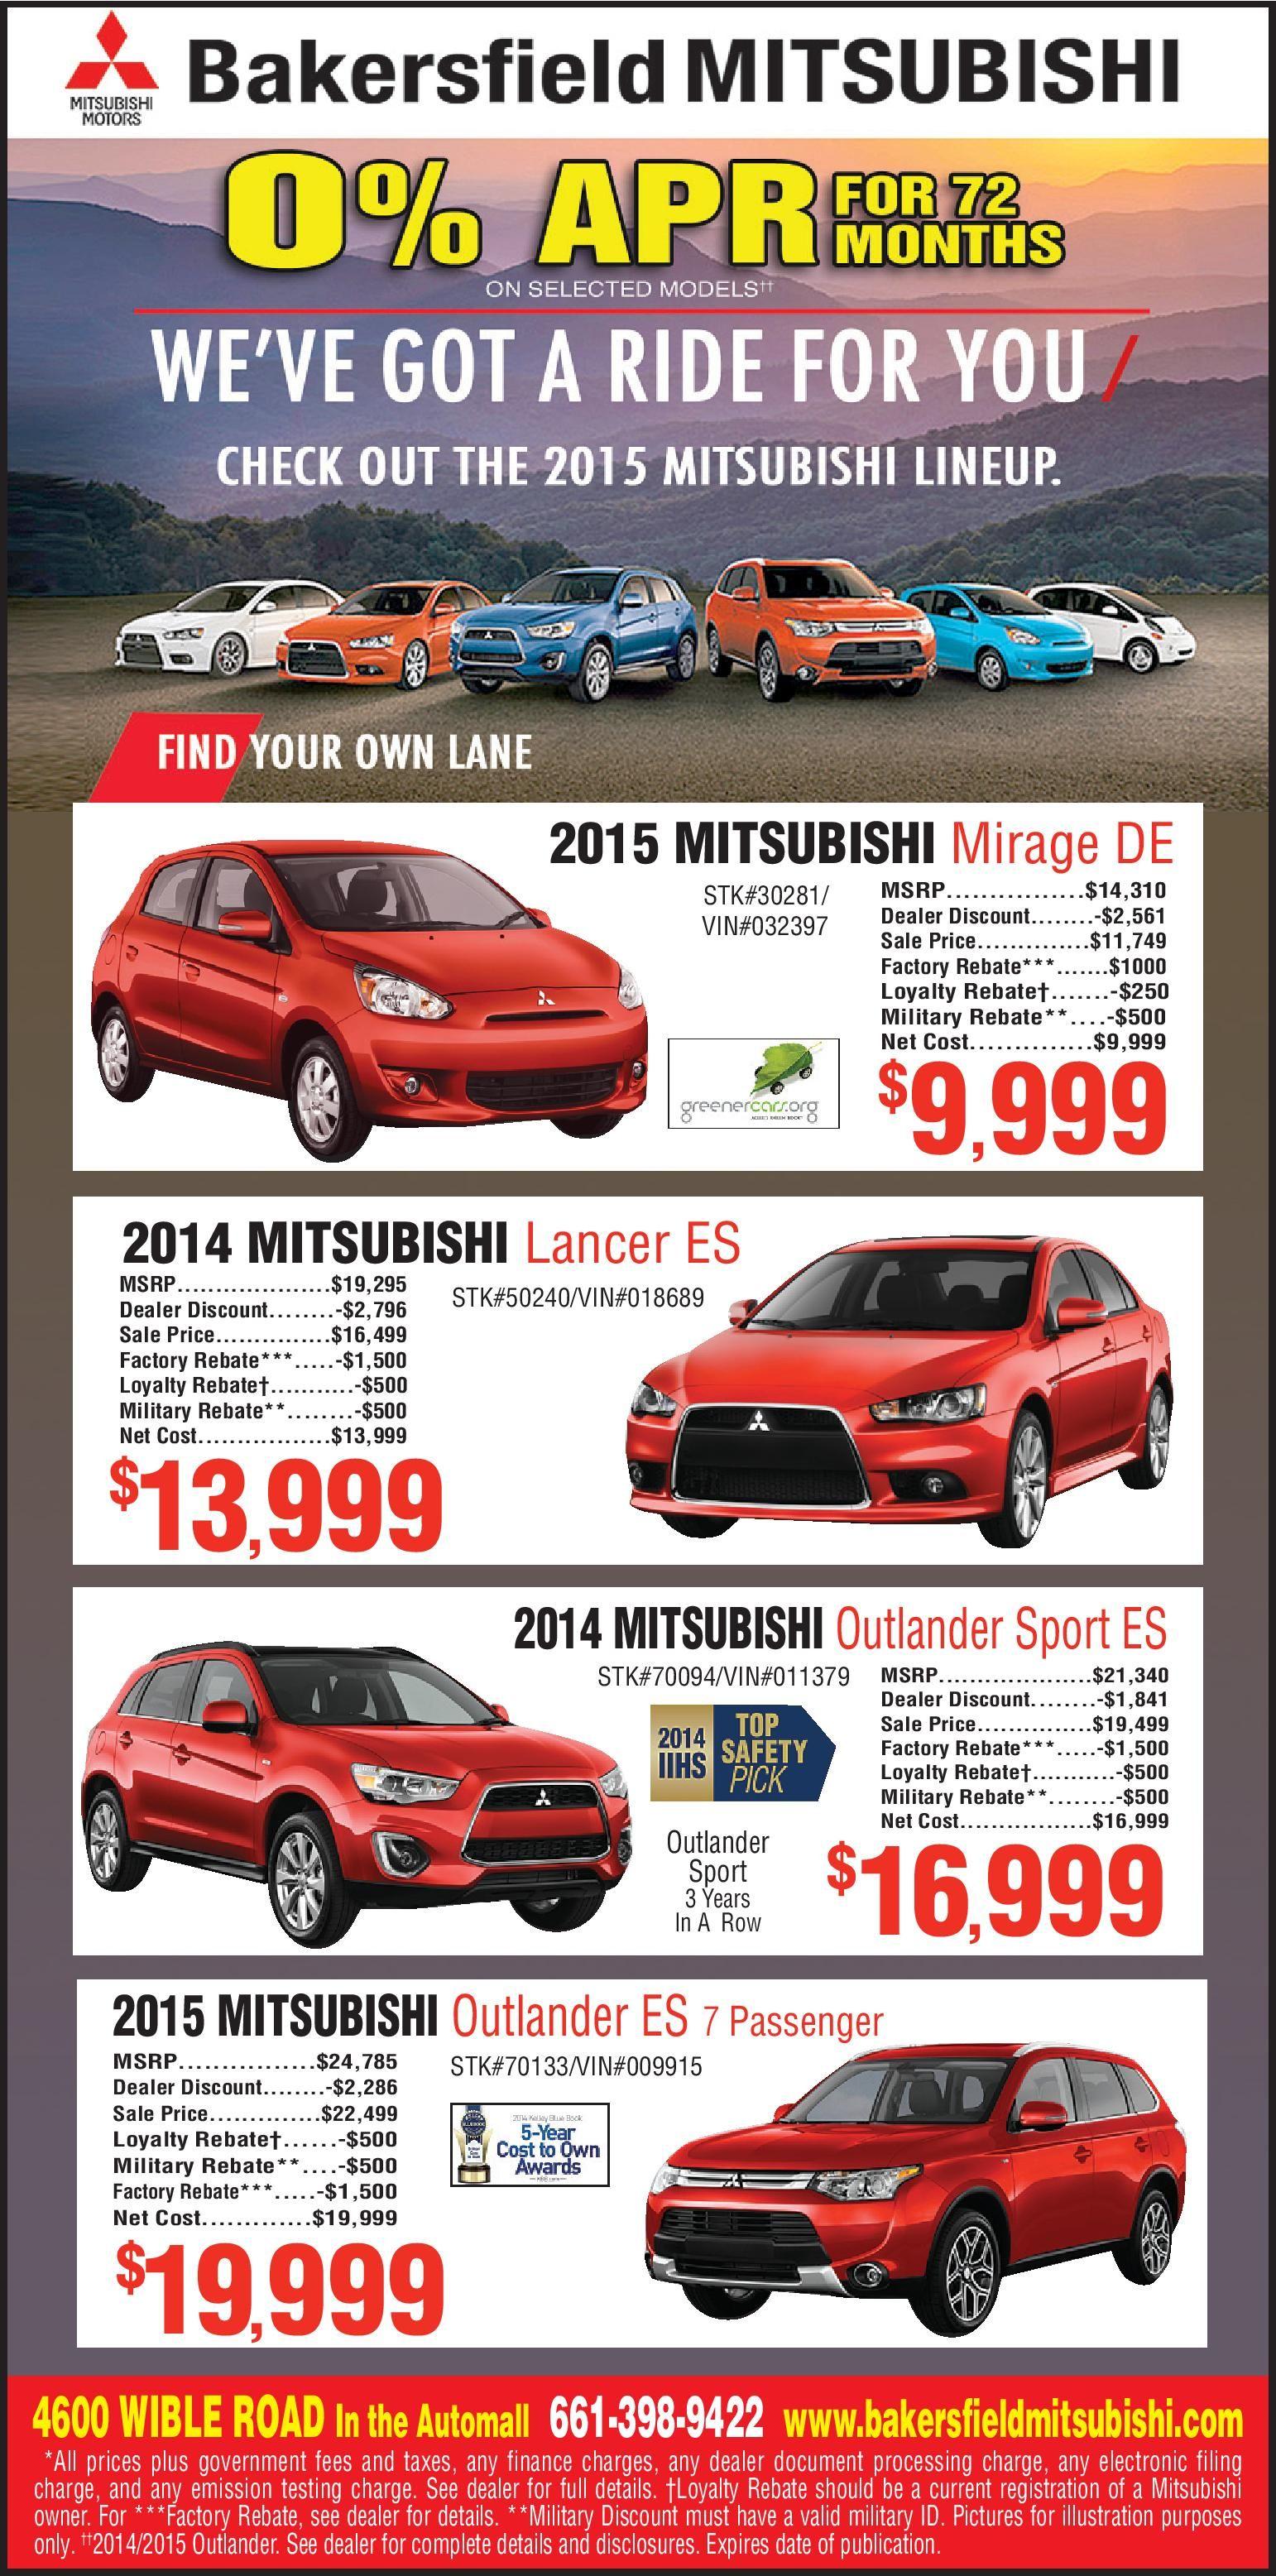 Print Ad Specials Lancer Outlander Mirage Bakersfield Mitsubishi Bakersfield Mitsubishi Mirage Lancer